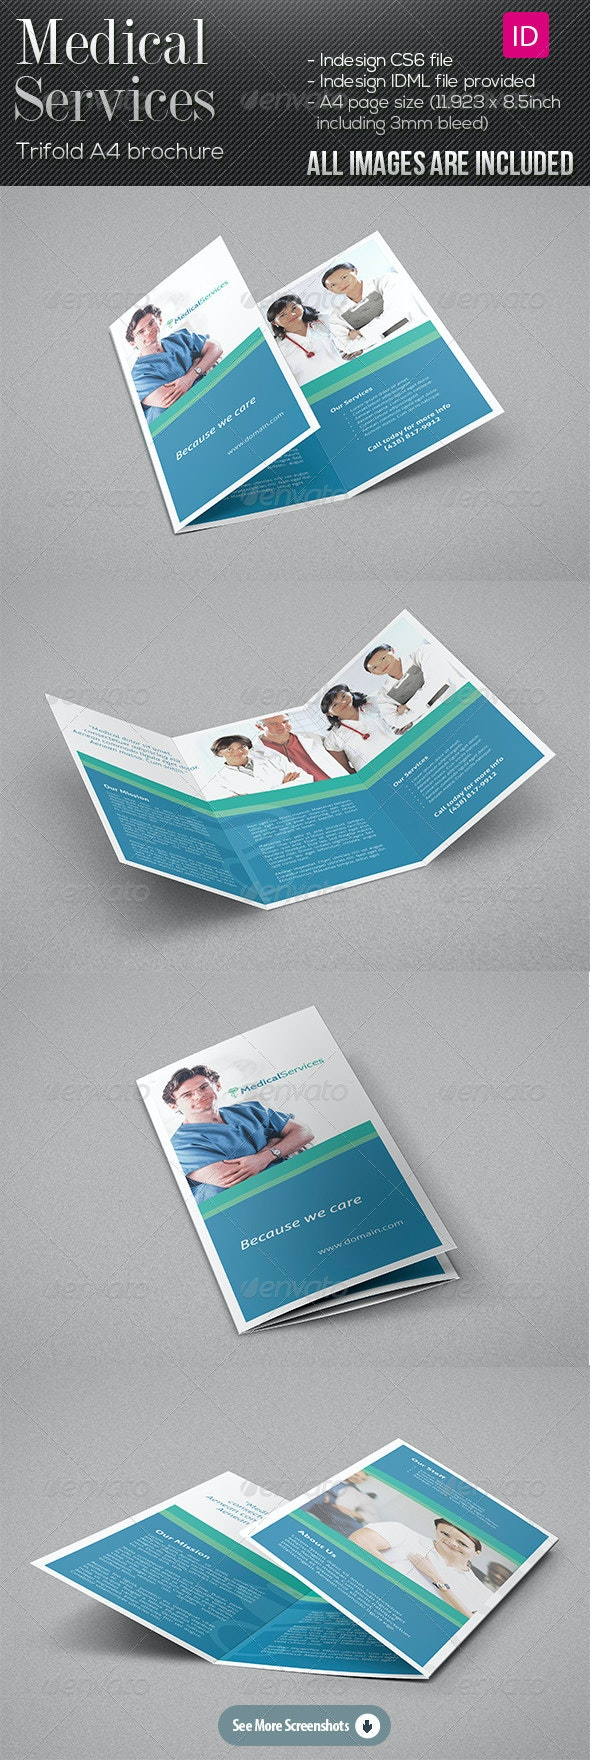 Medical Services - Trifold Brochure - Informational Brochures